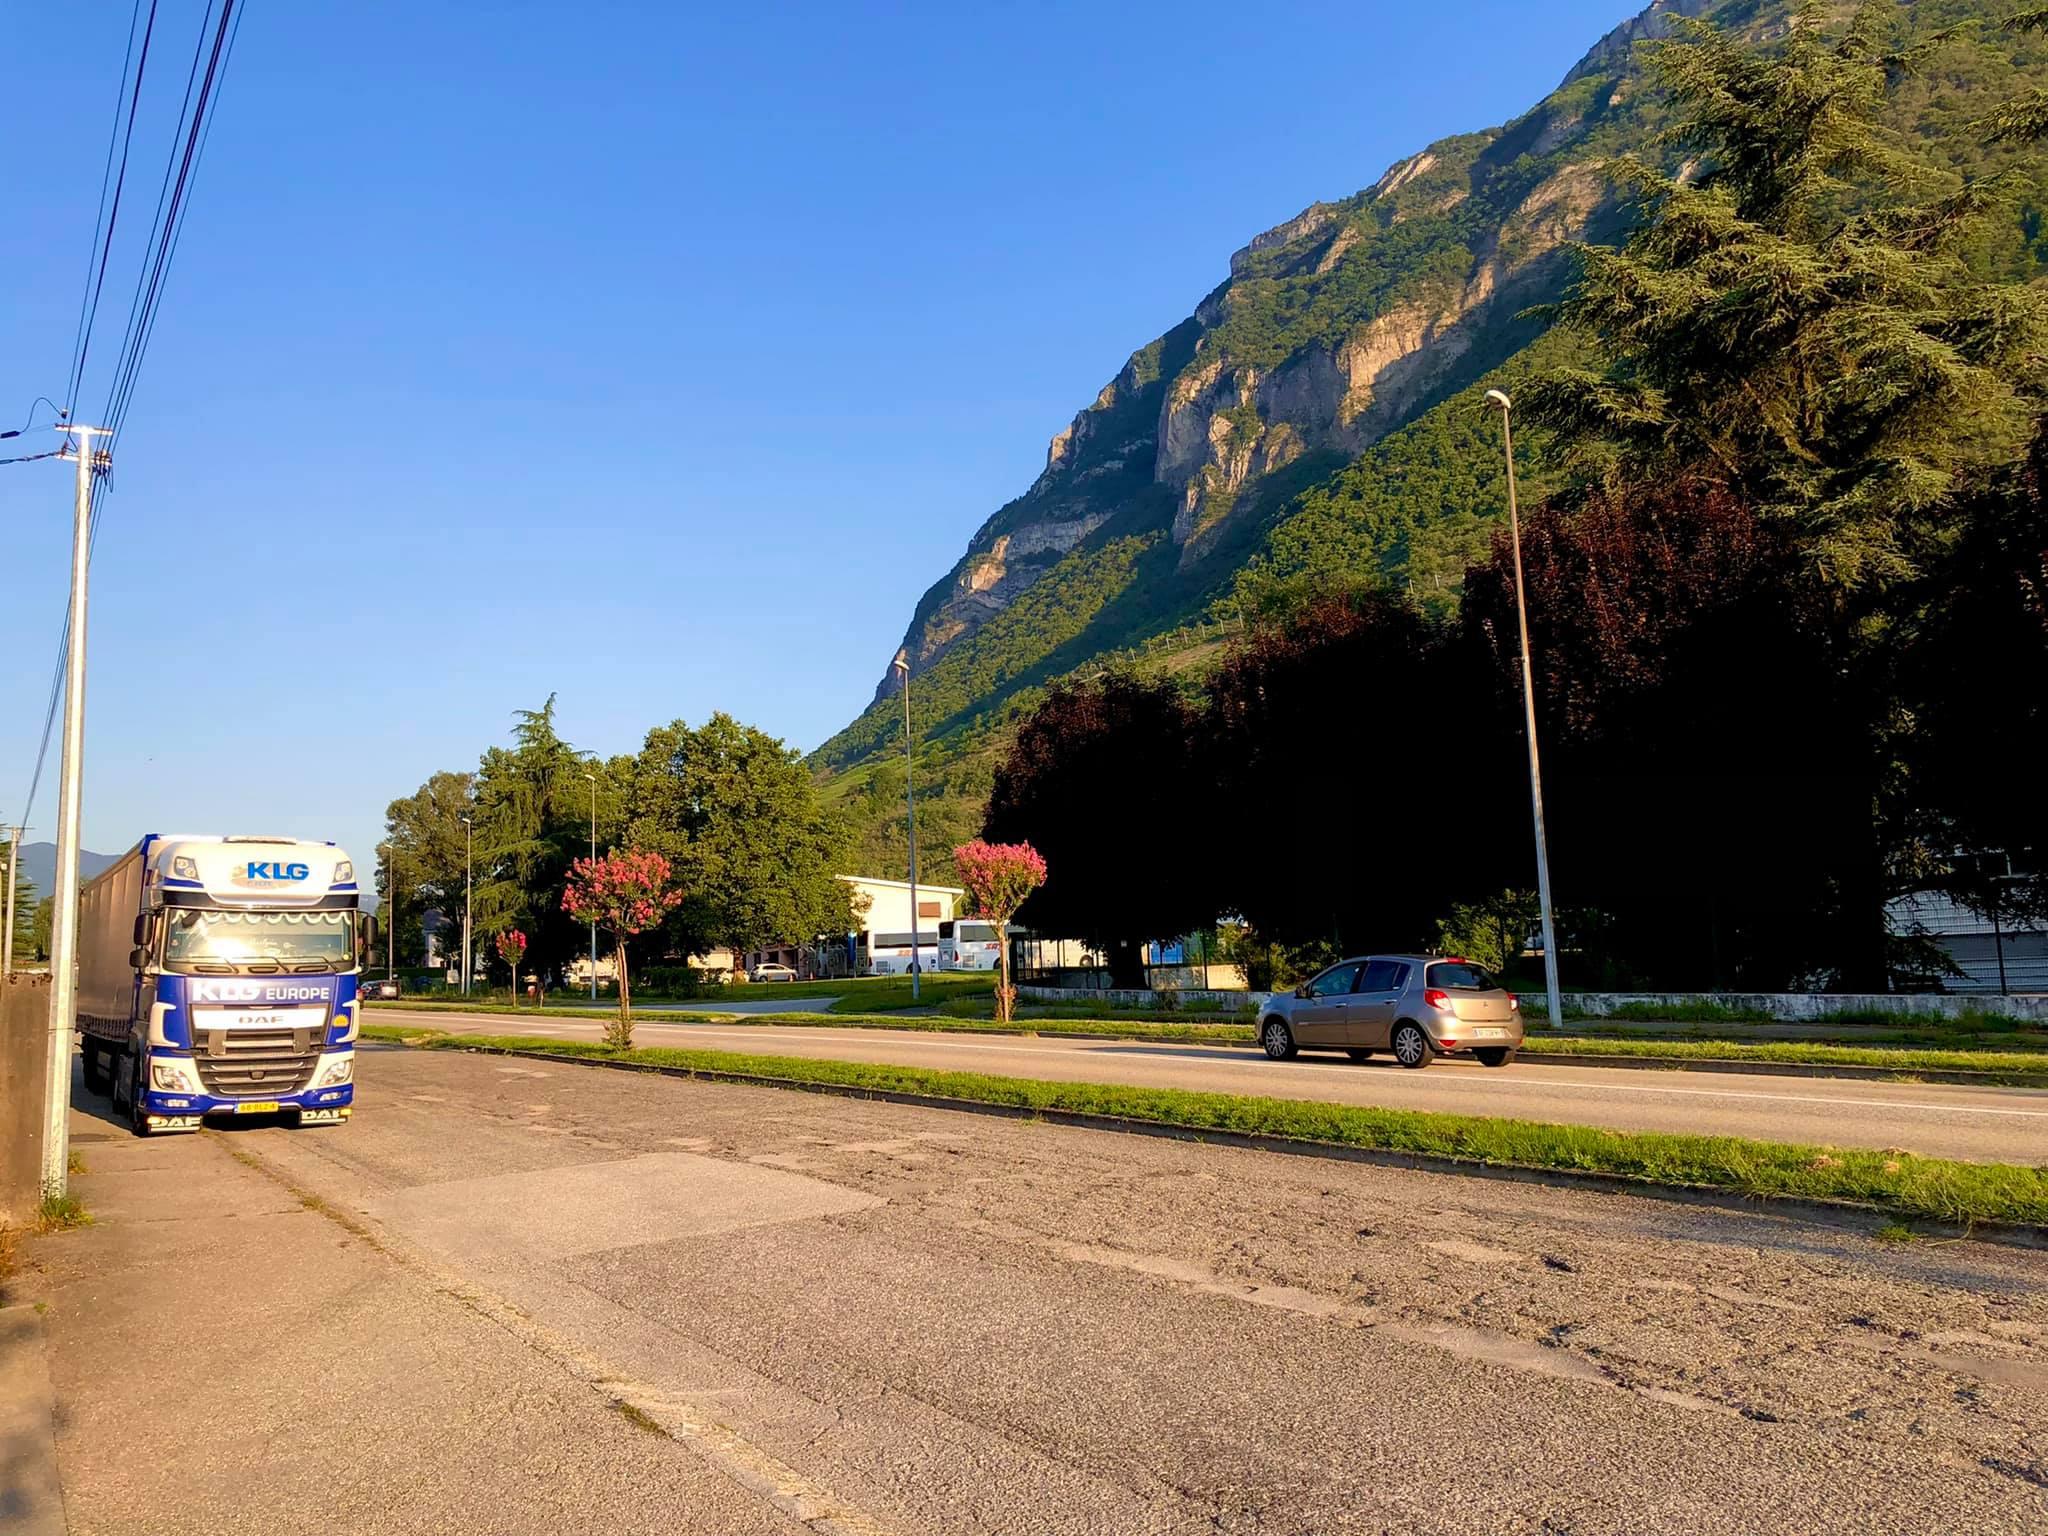 Lyon-Grenoble-lossen-Mantmelian-laden--(8)